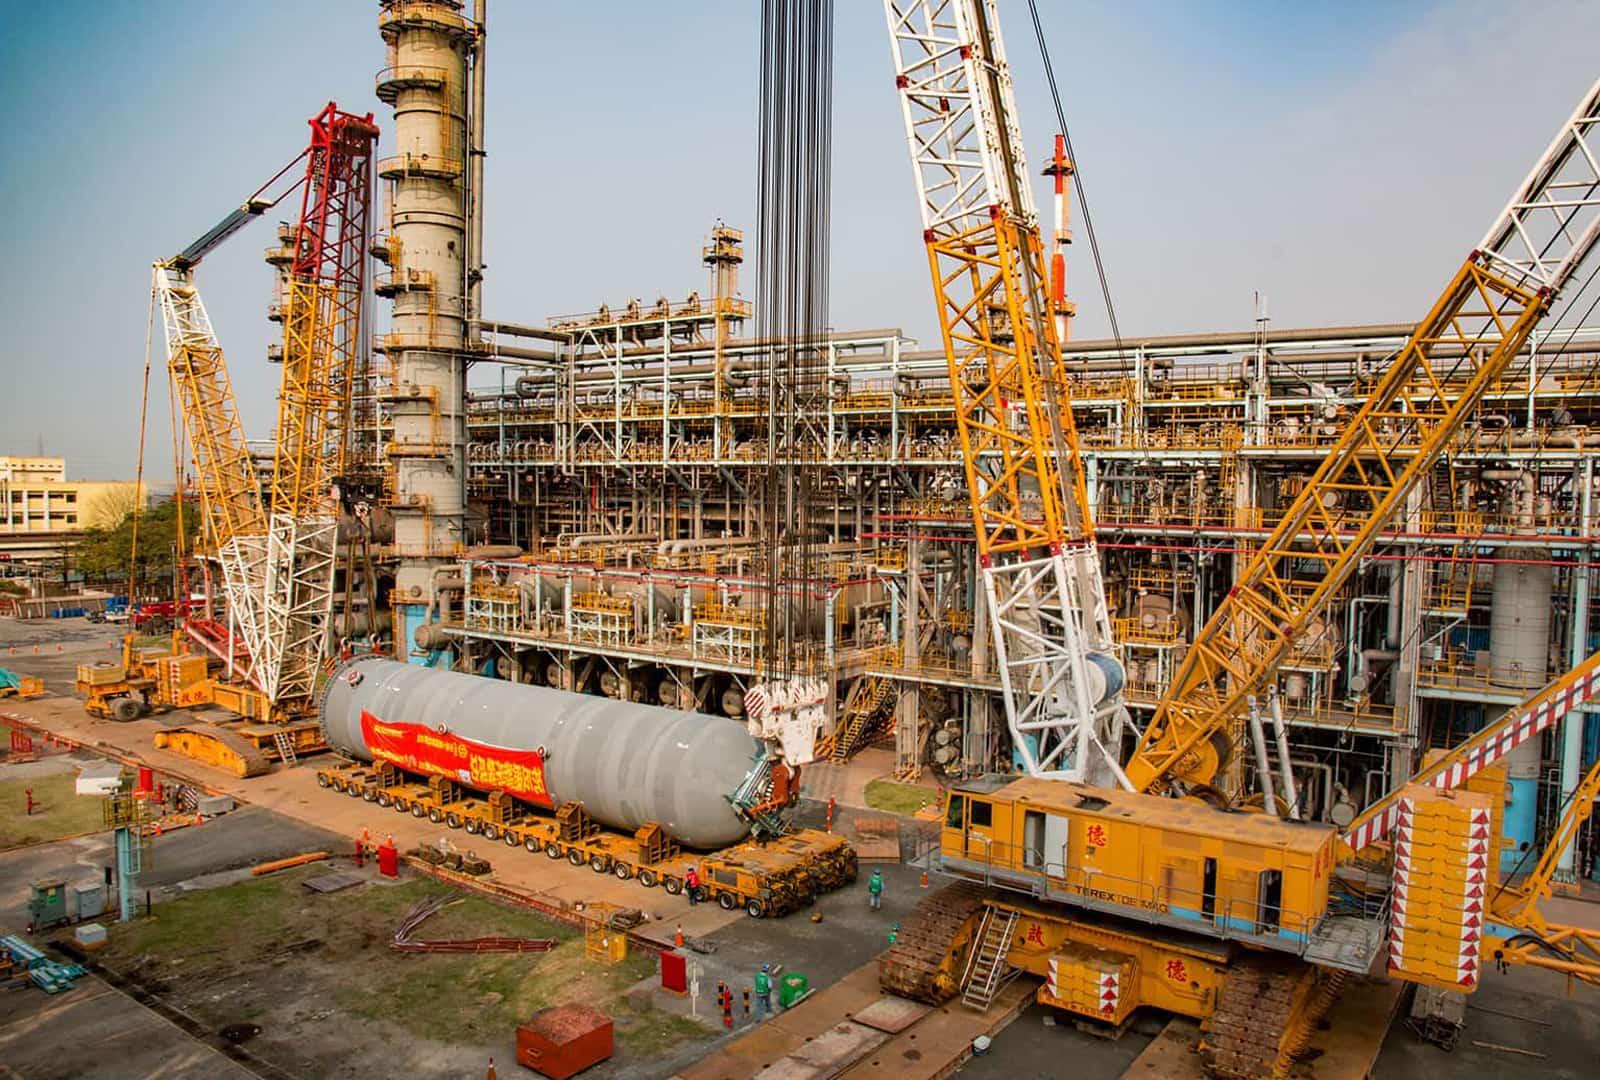 2016 Dalin Oil Refining Reactor lifting